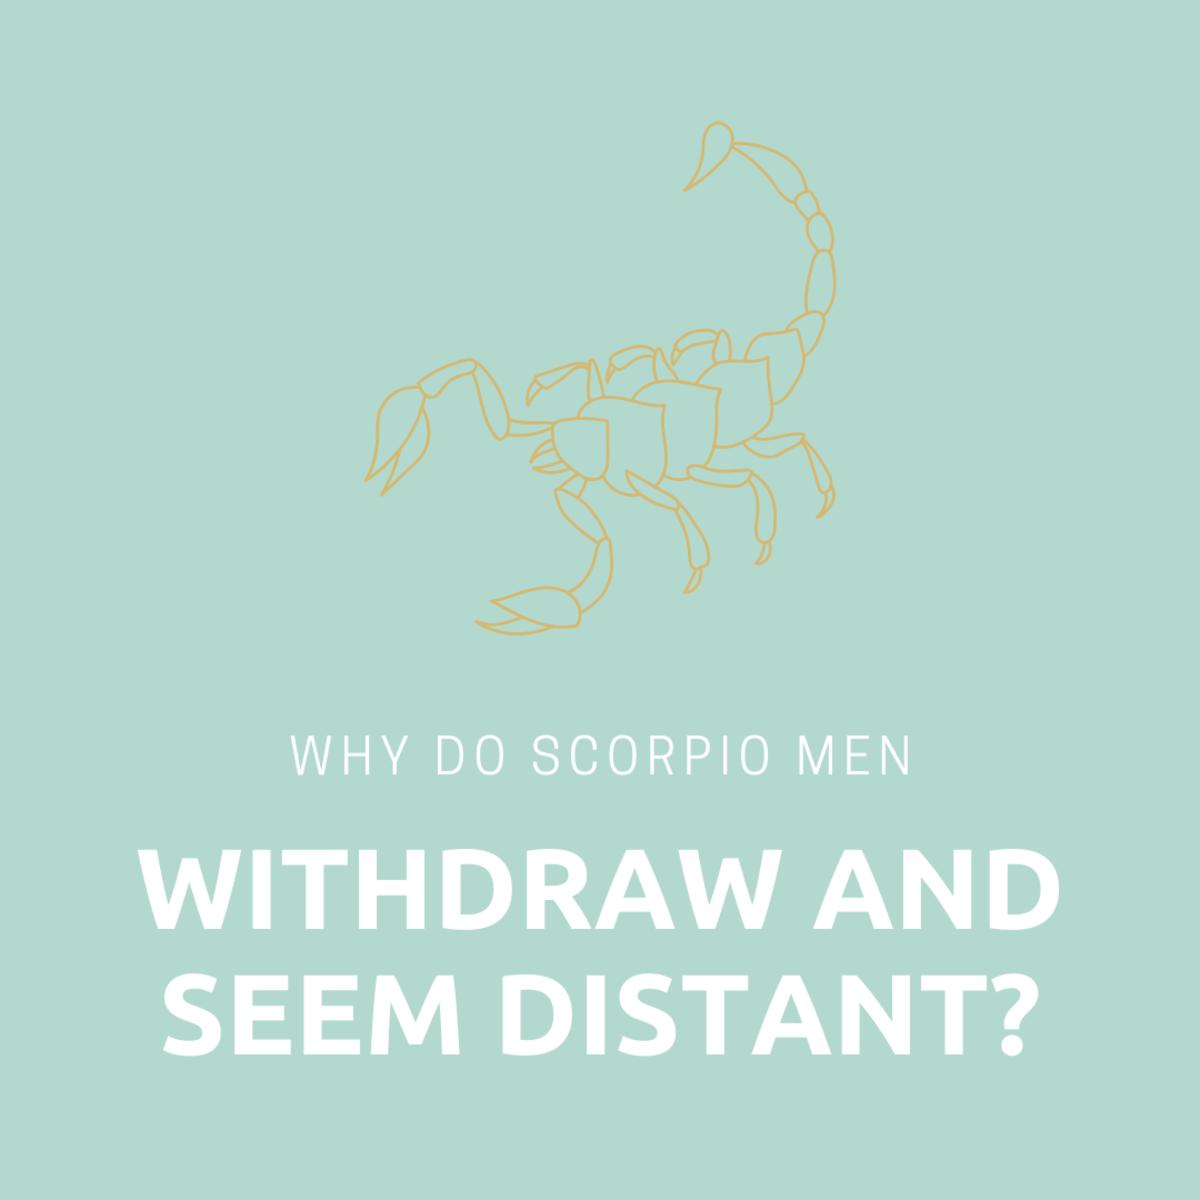 Why Do Scorpio Men Withdraw and Seem Distant? | Exemplore